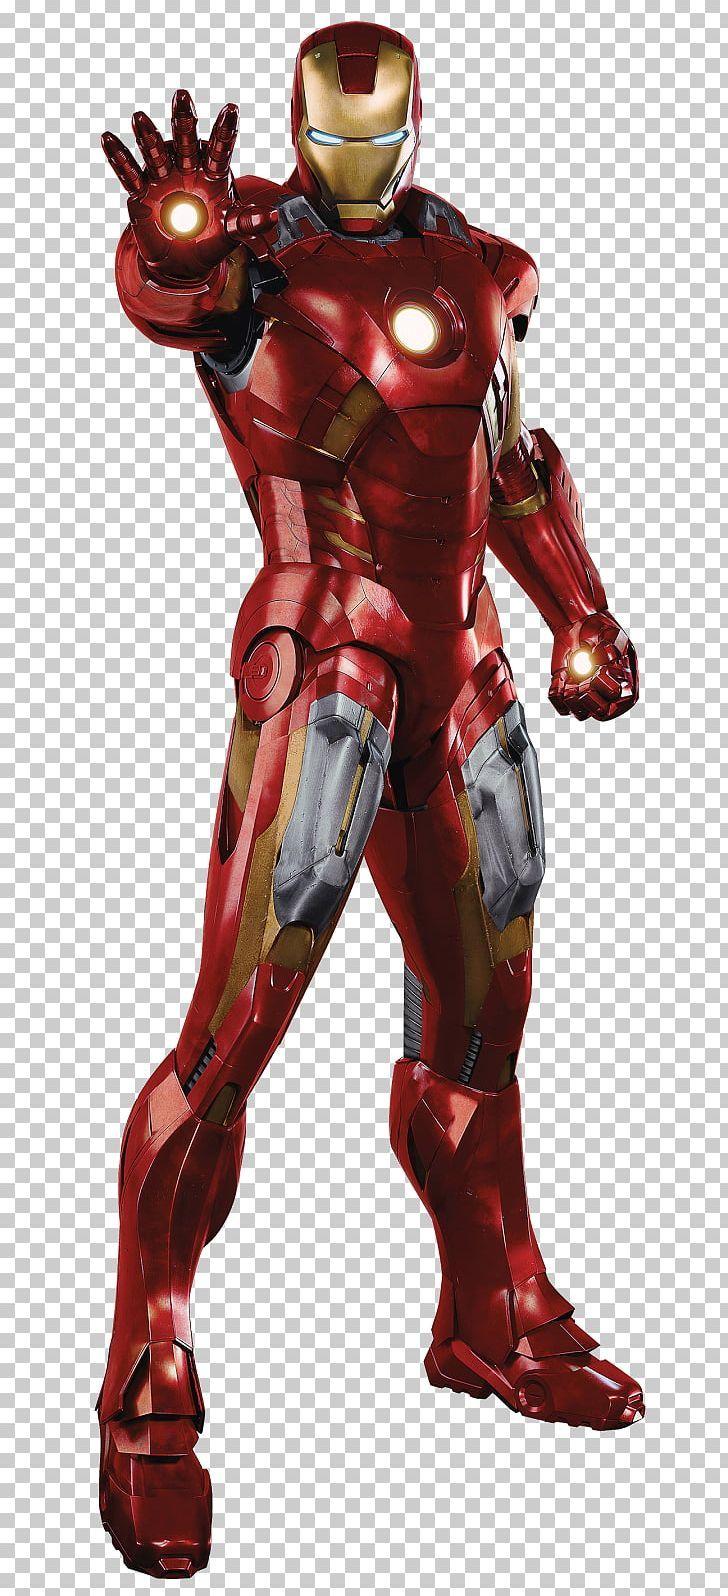 Iron Man Iron Monger Edwin Jarvis War Machine Extremis Png Extremis Iron Man Iron Monger War Machine Iron Man Armor Iron Man War Machine